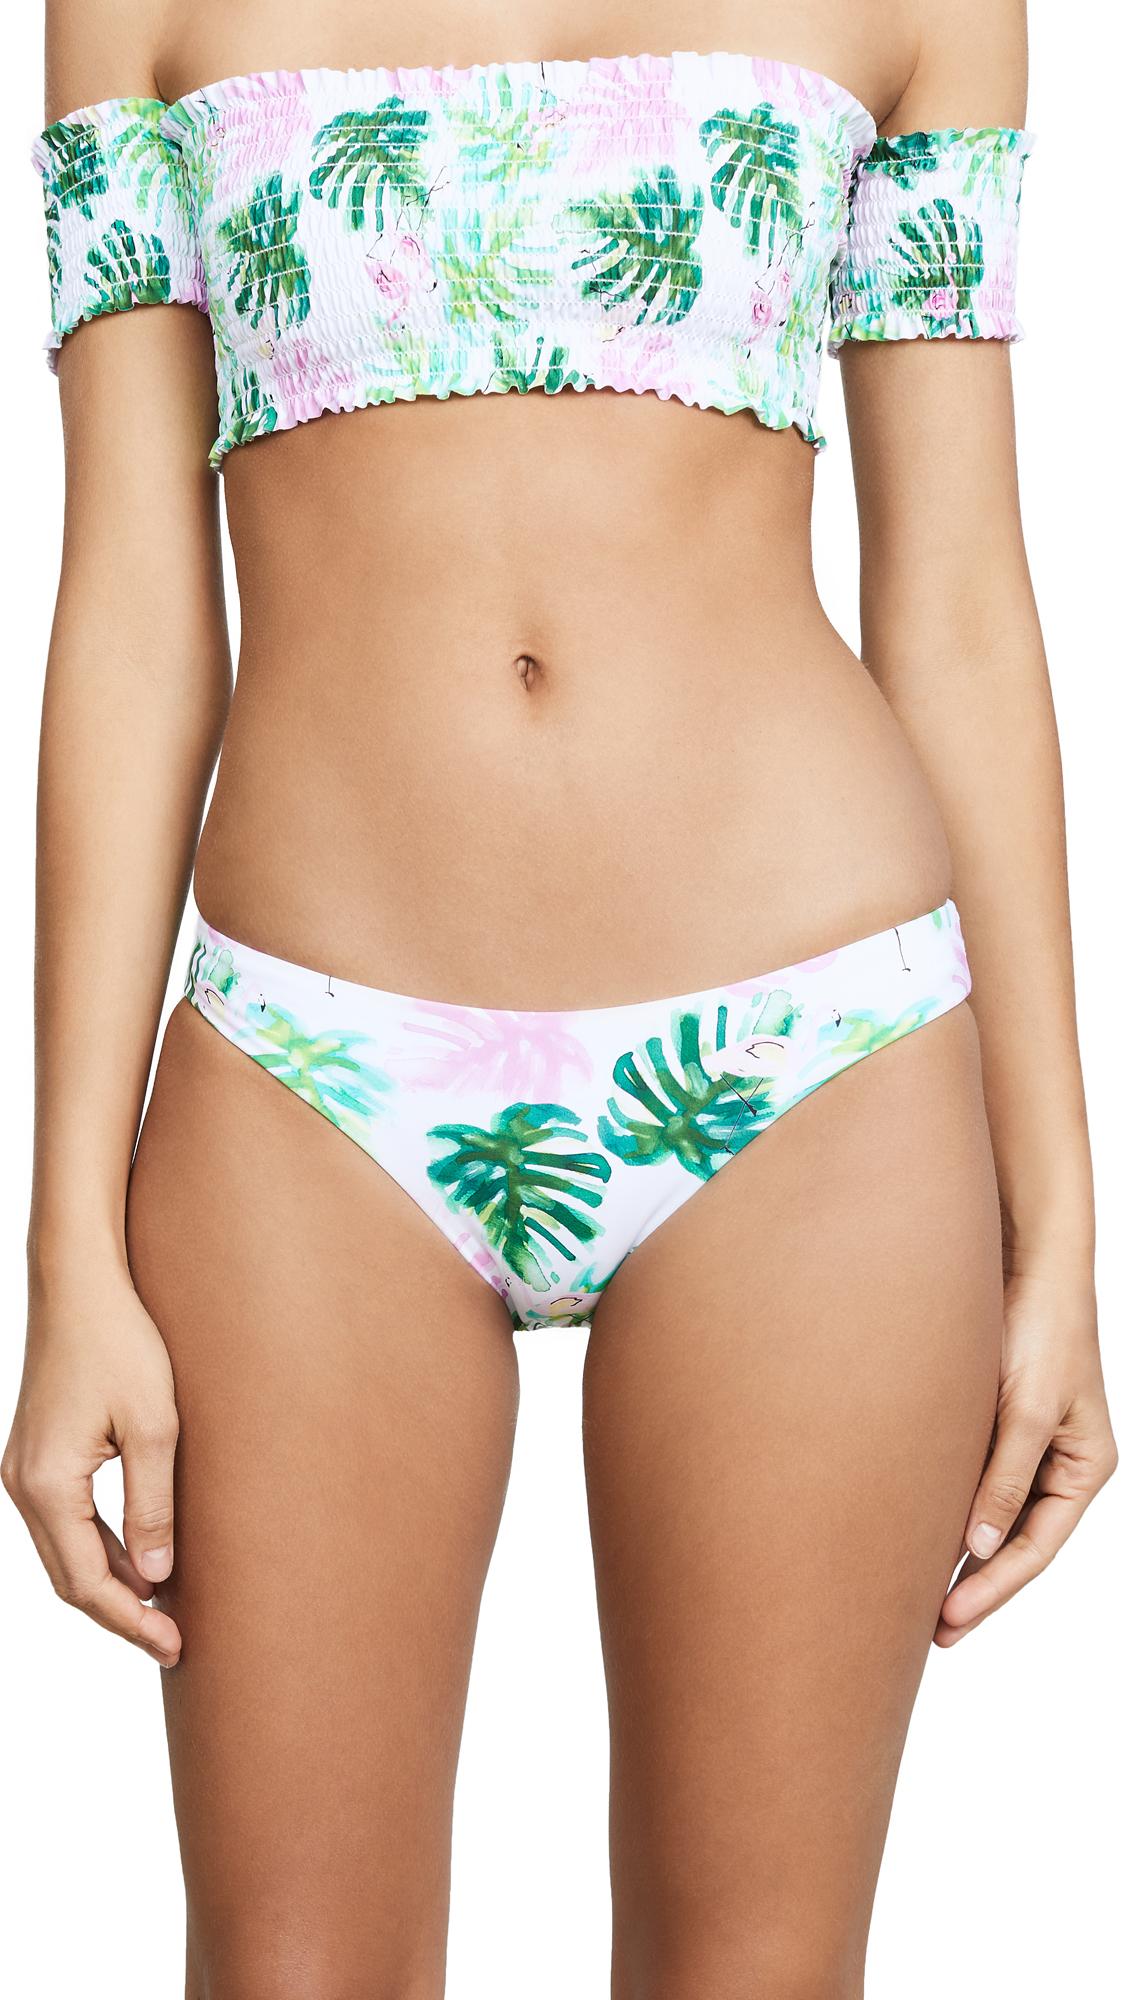 PilyQ Ruched Bikini Bottoms In Multi